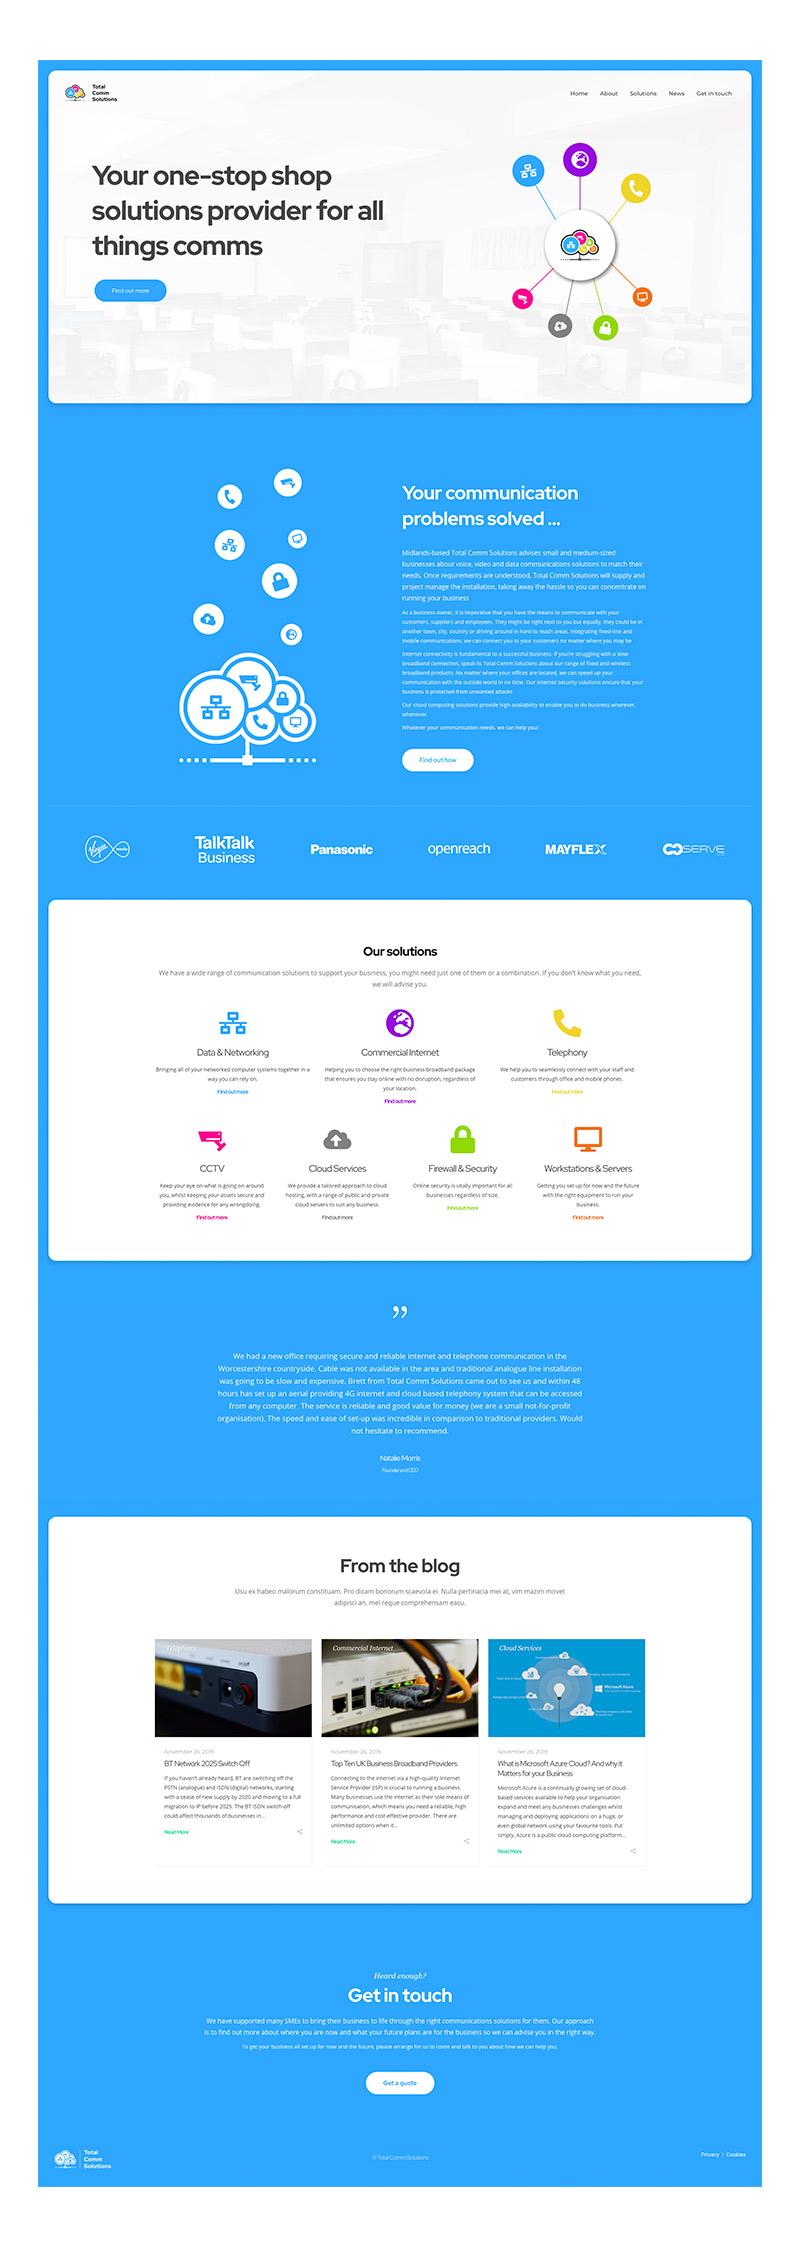 Total Comm Solutions - Website Homepage Design